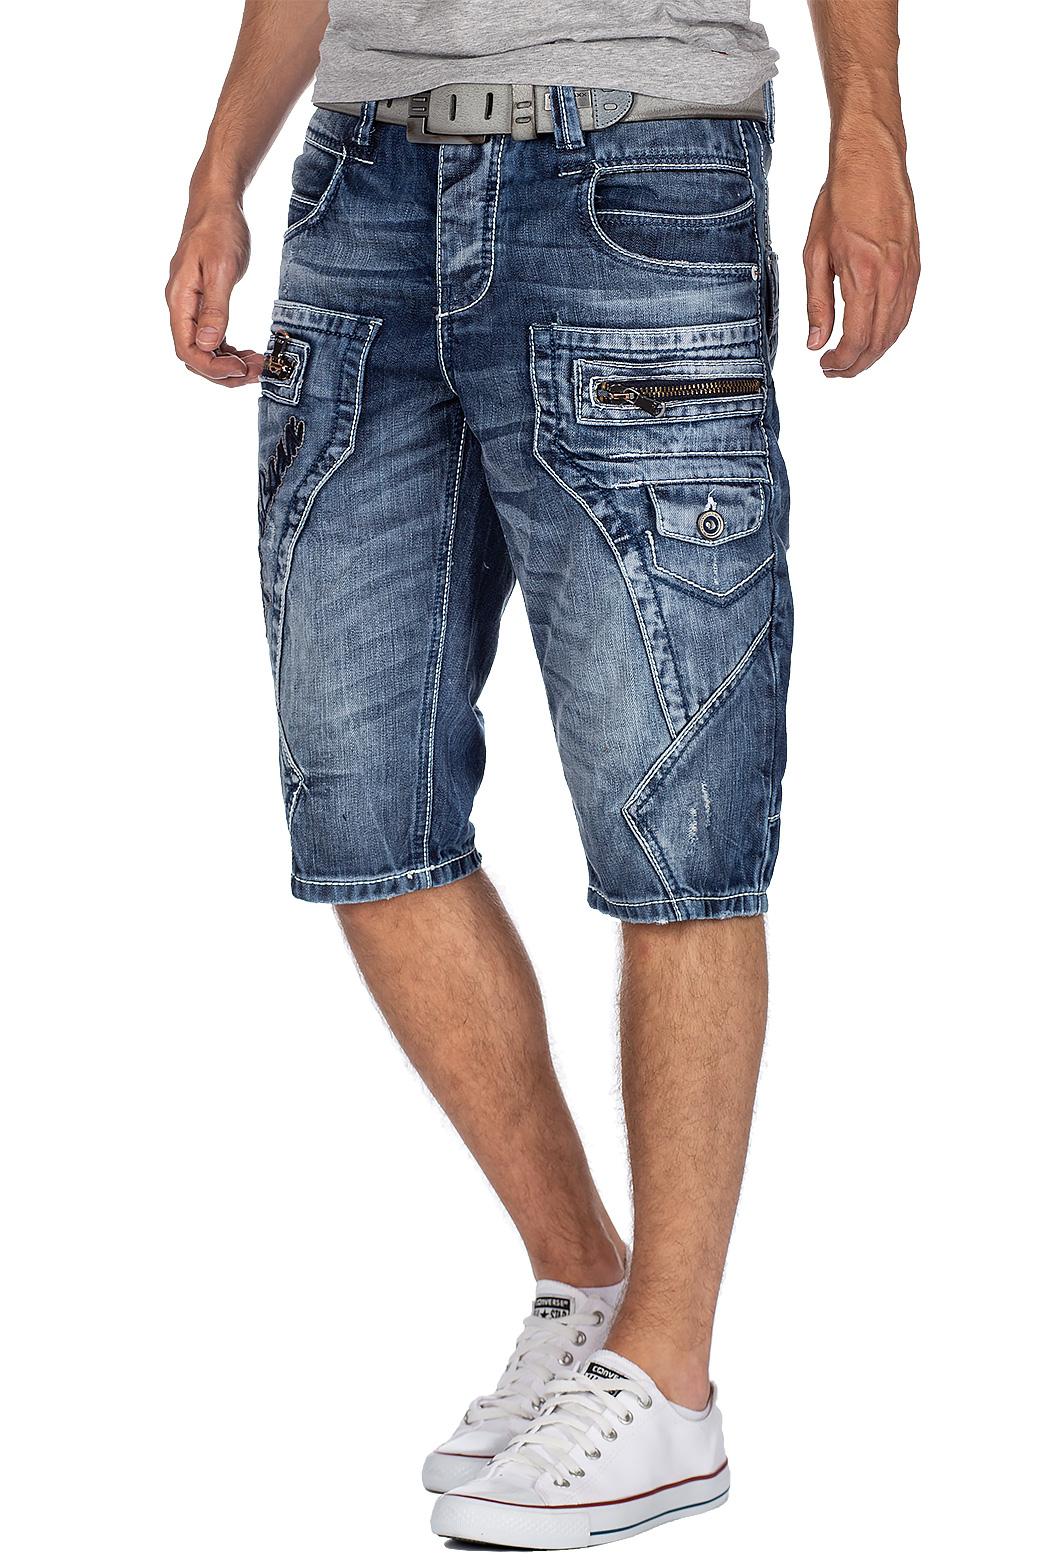 Herren Bermuda Shorts Hell Stretch Jeans Kurz Capri Hose Weiß Sommer Denim Pants